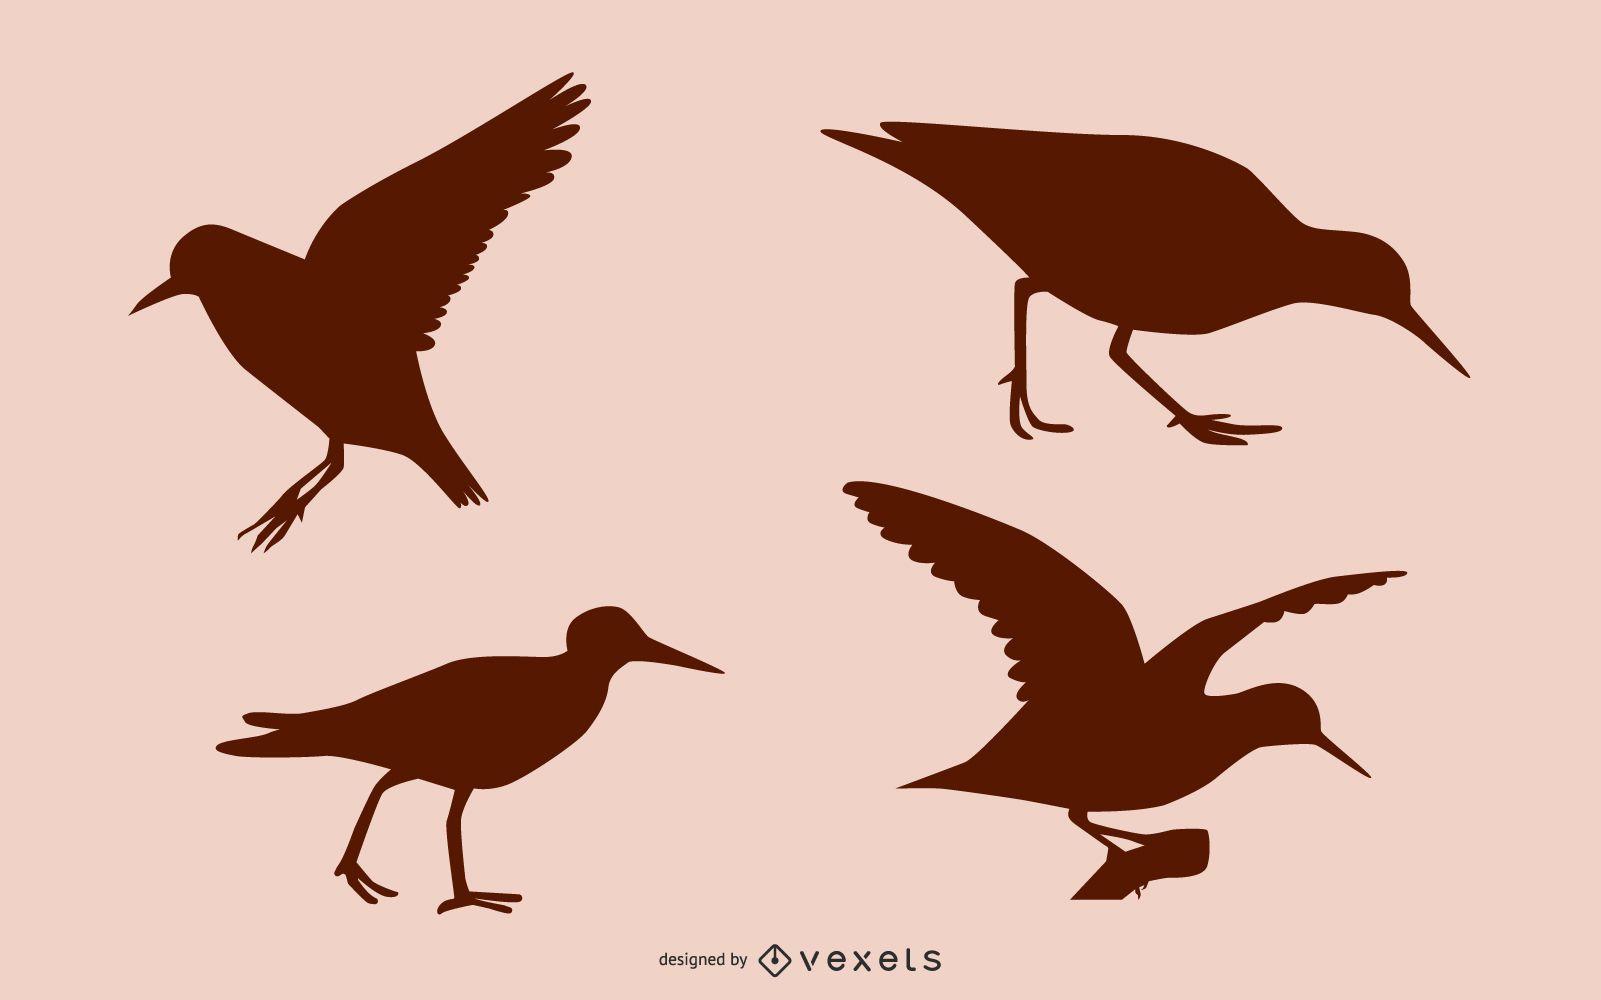 Sandpiper bird silhouette set